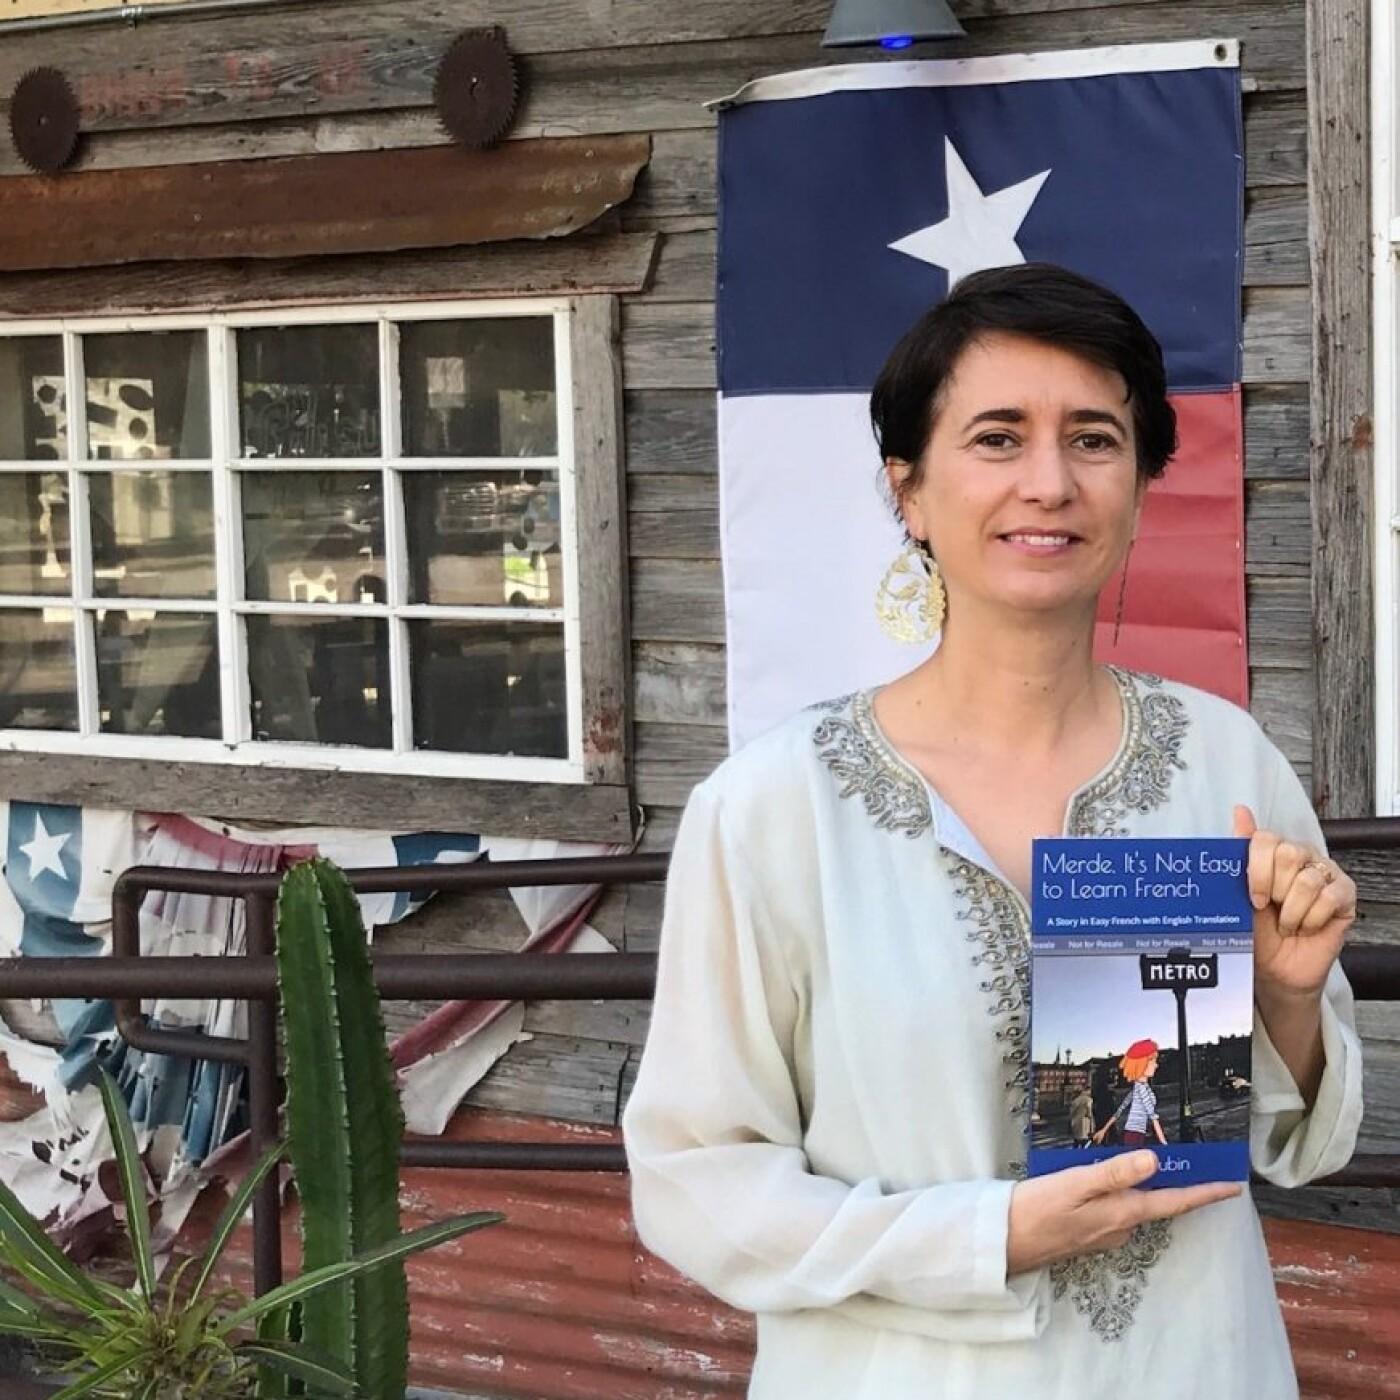 France Dubin, auteure expatriée au Texas - 16 06 2021 - StereoChic Radio